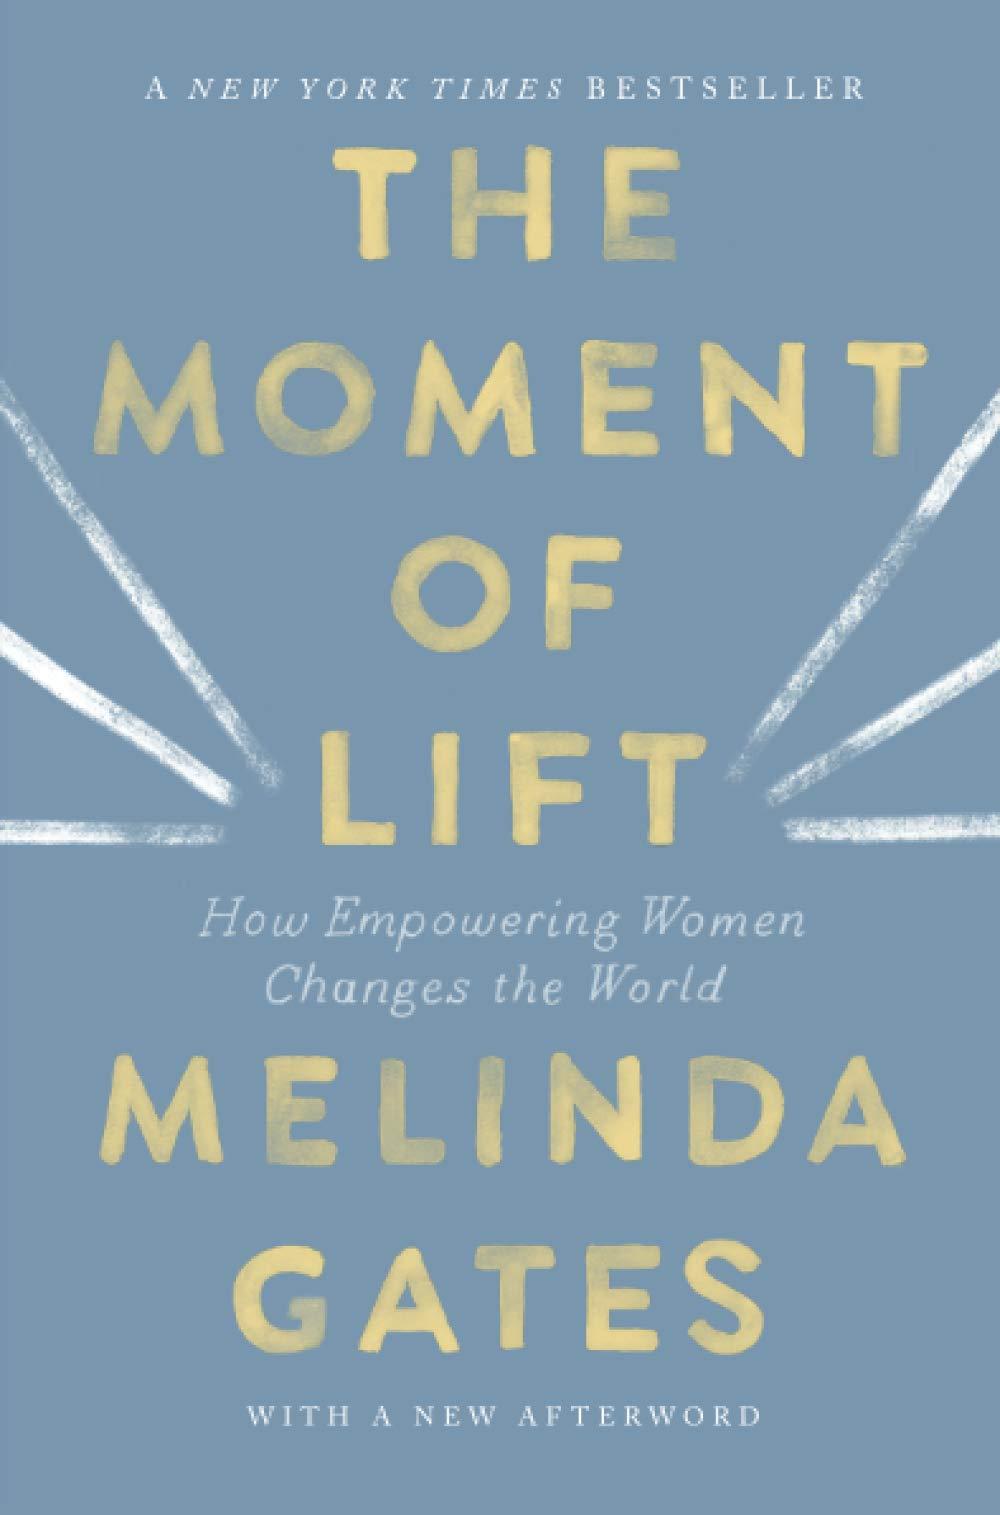 Moment of Lift: Gates, Melinda: 9781250257727: Amazon.com: Books